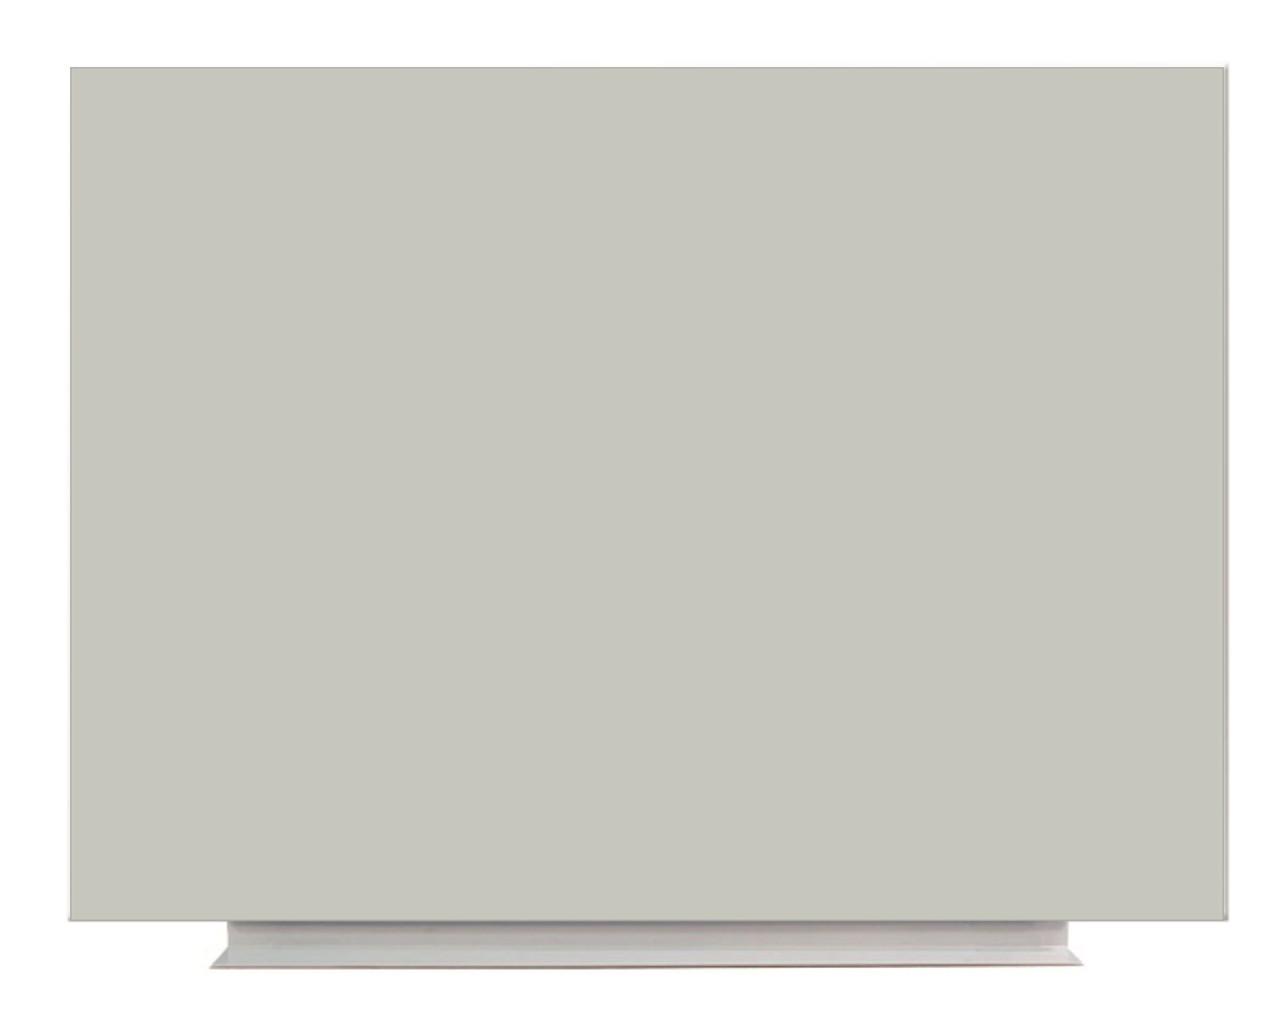 Доска магнитно-маркерная б/р 100x150 Серый